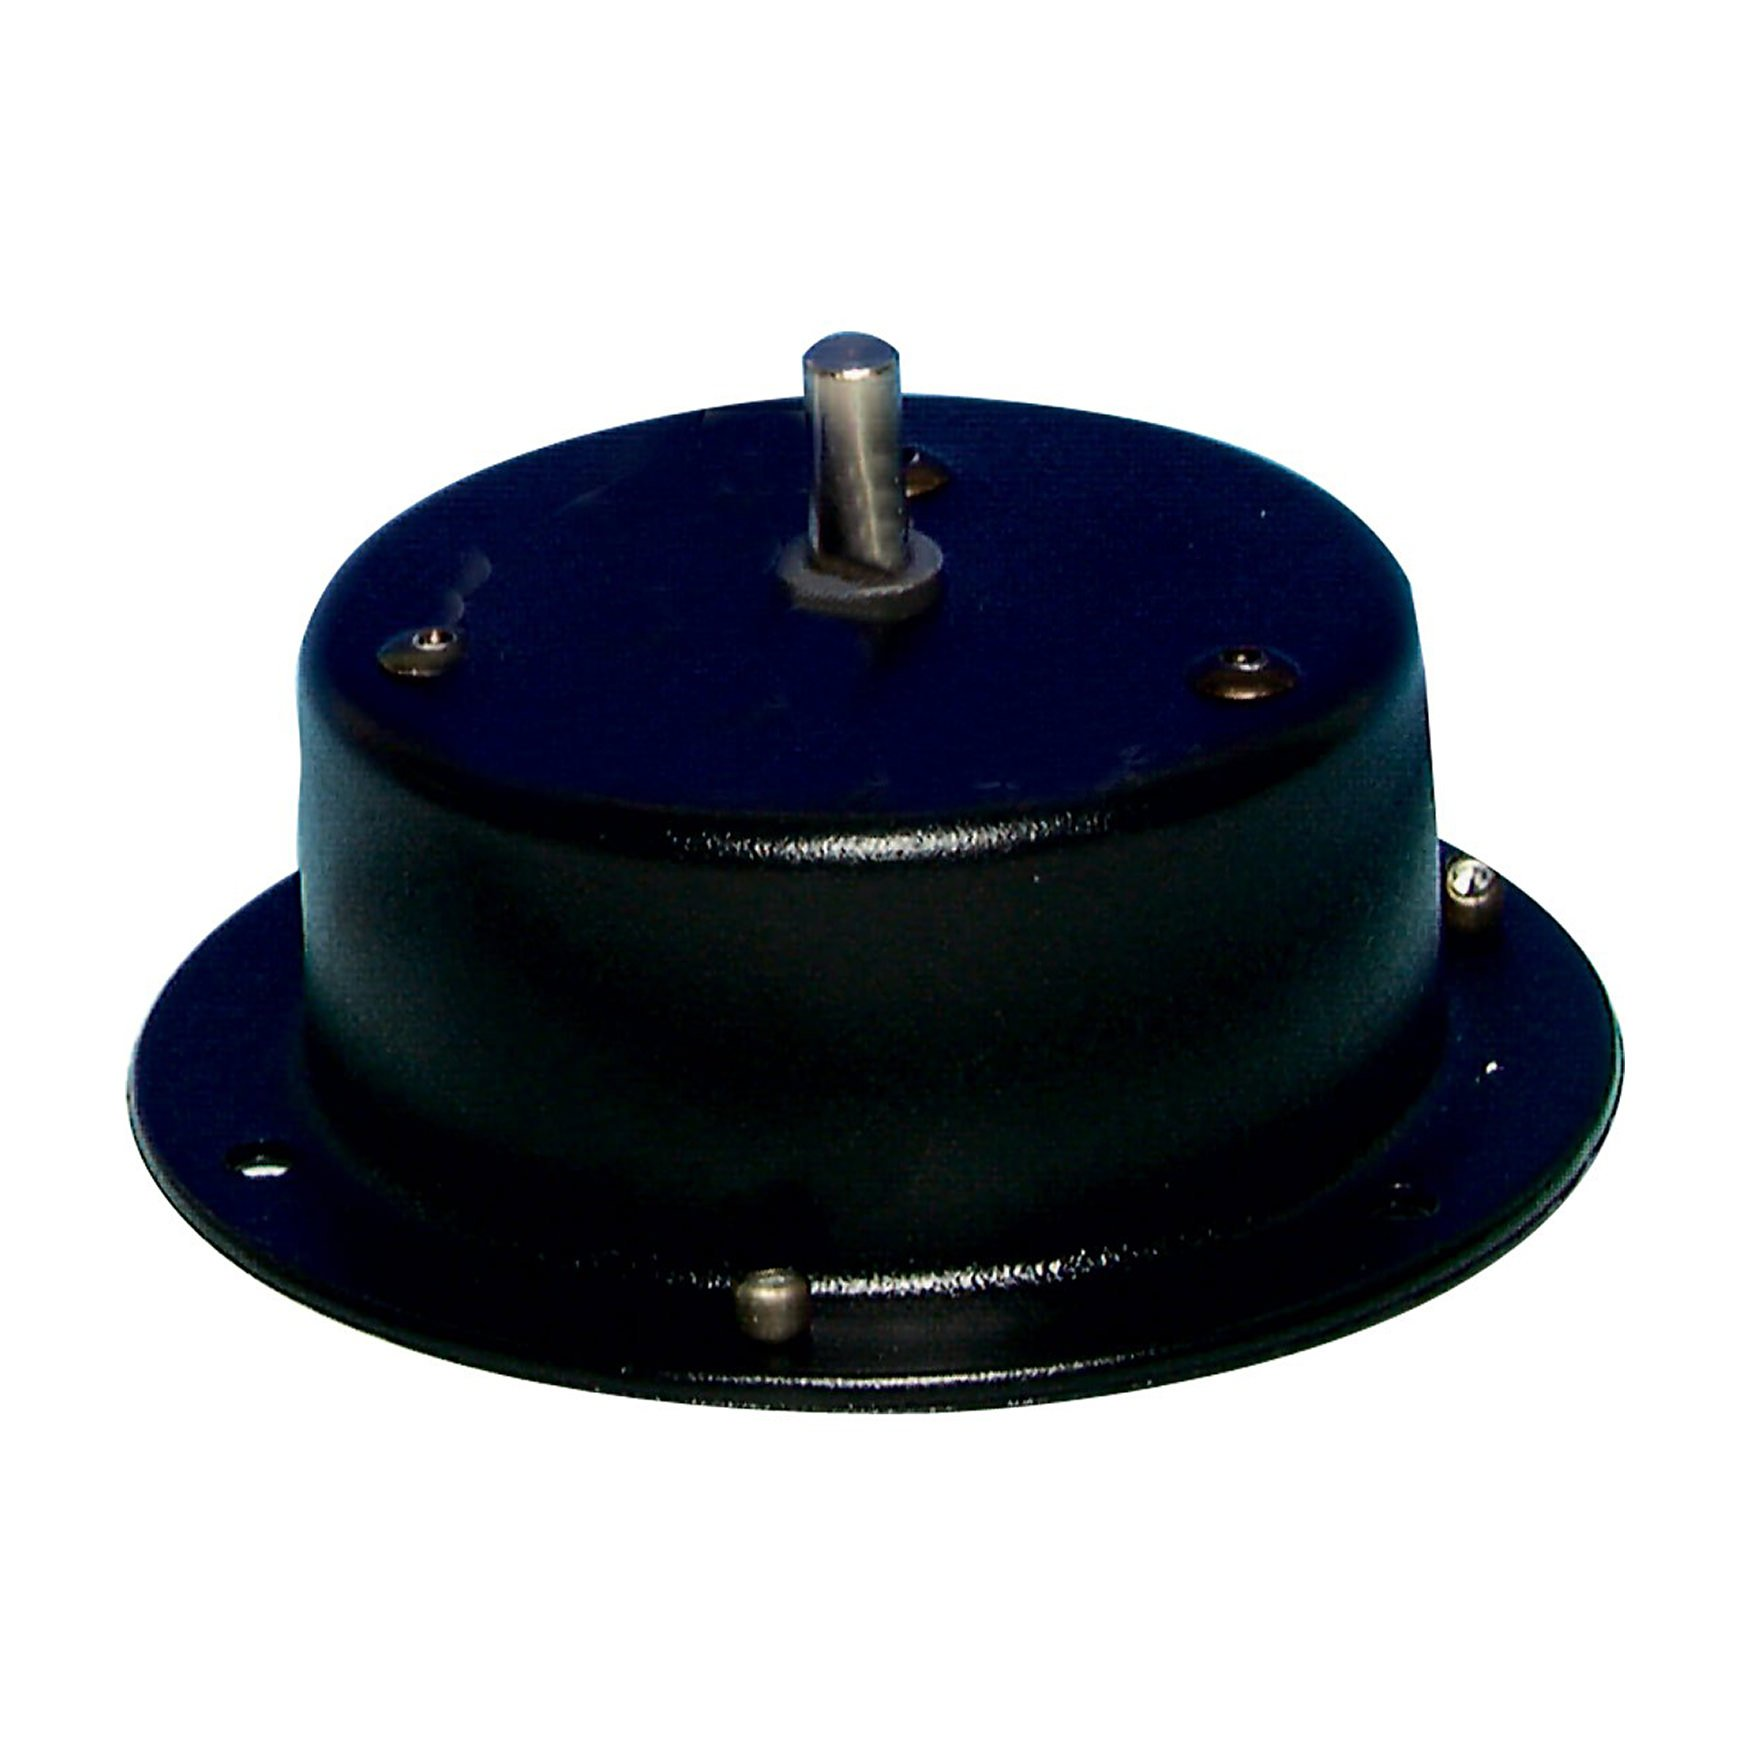 American DJ mirrorballmotor 2,5 U/min (20cm/3kg)